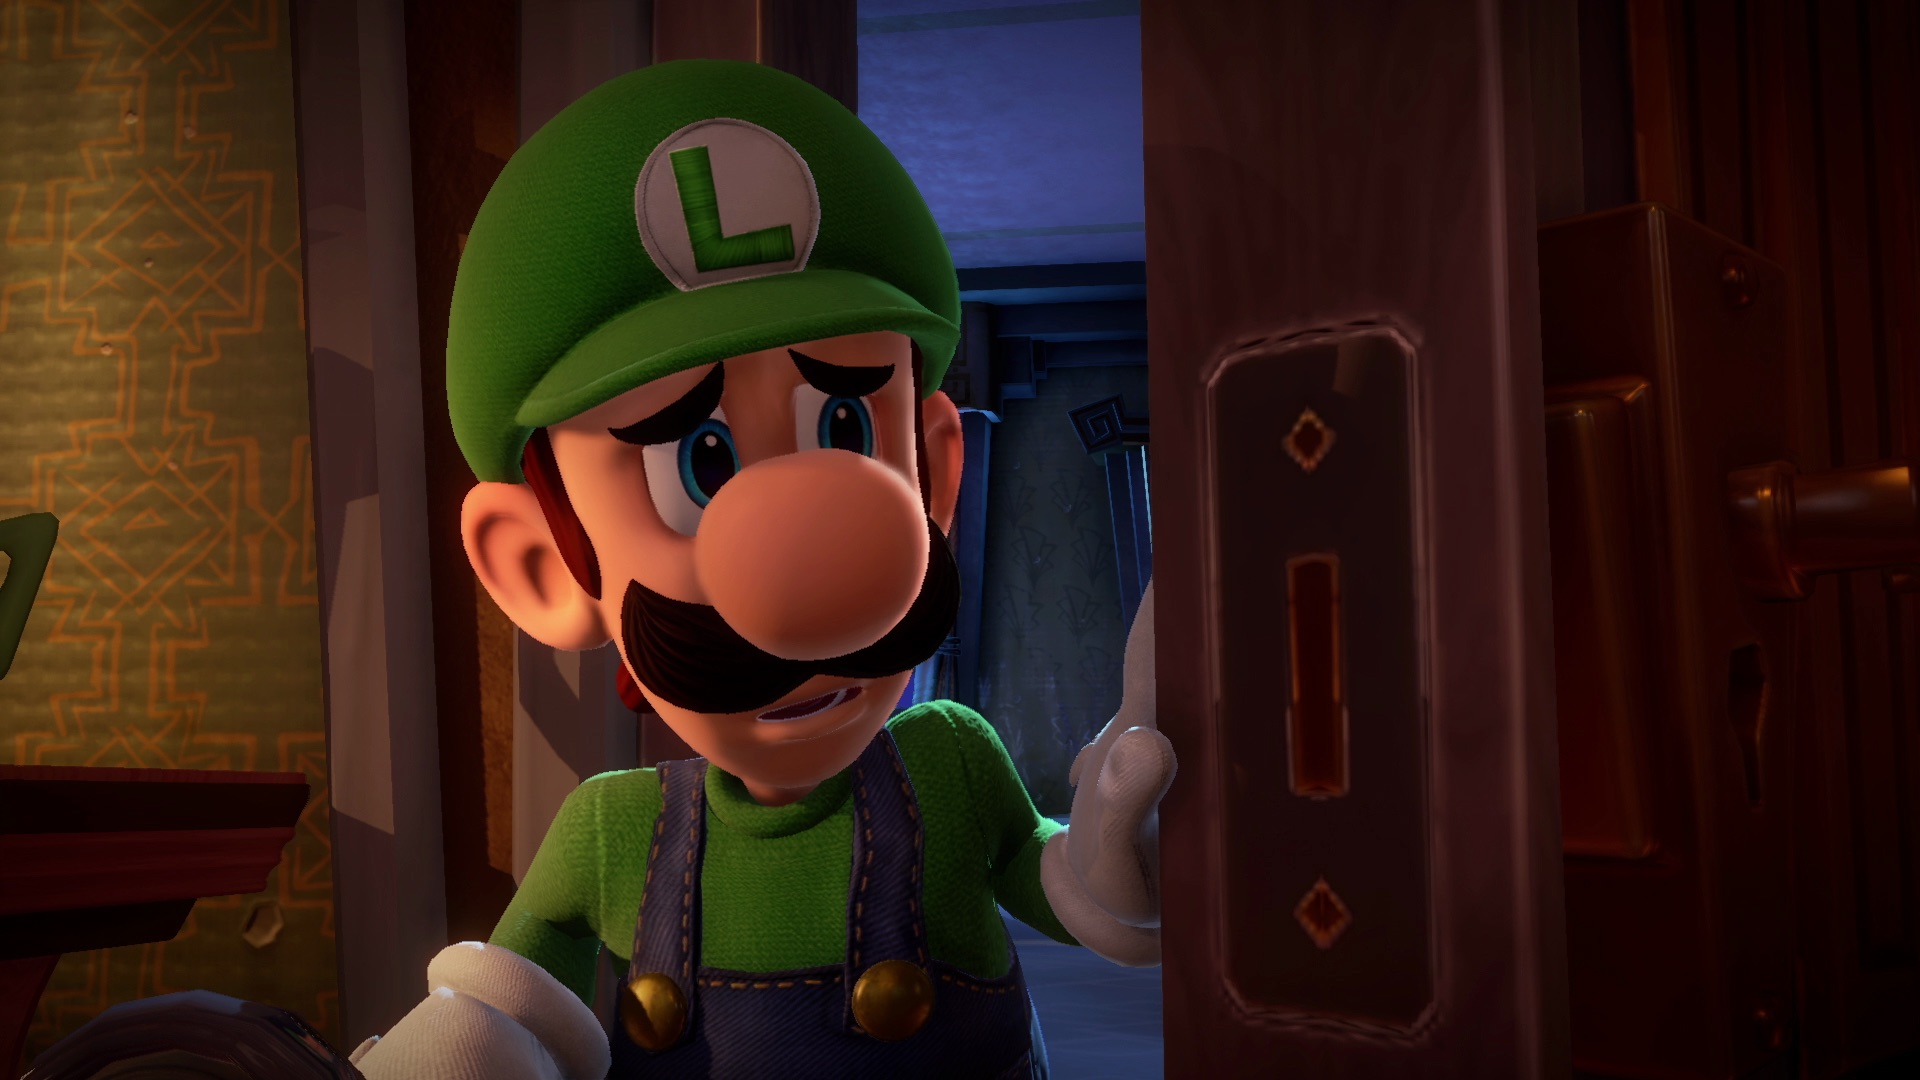 Luigi's Mansion 3 E3 2019 Screenshot 2